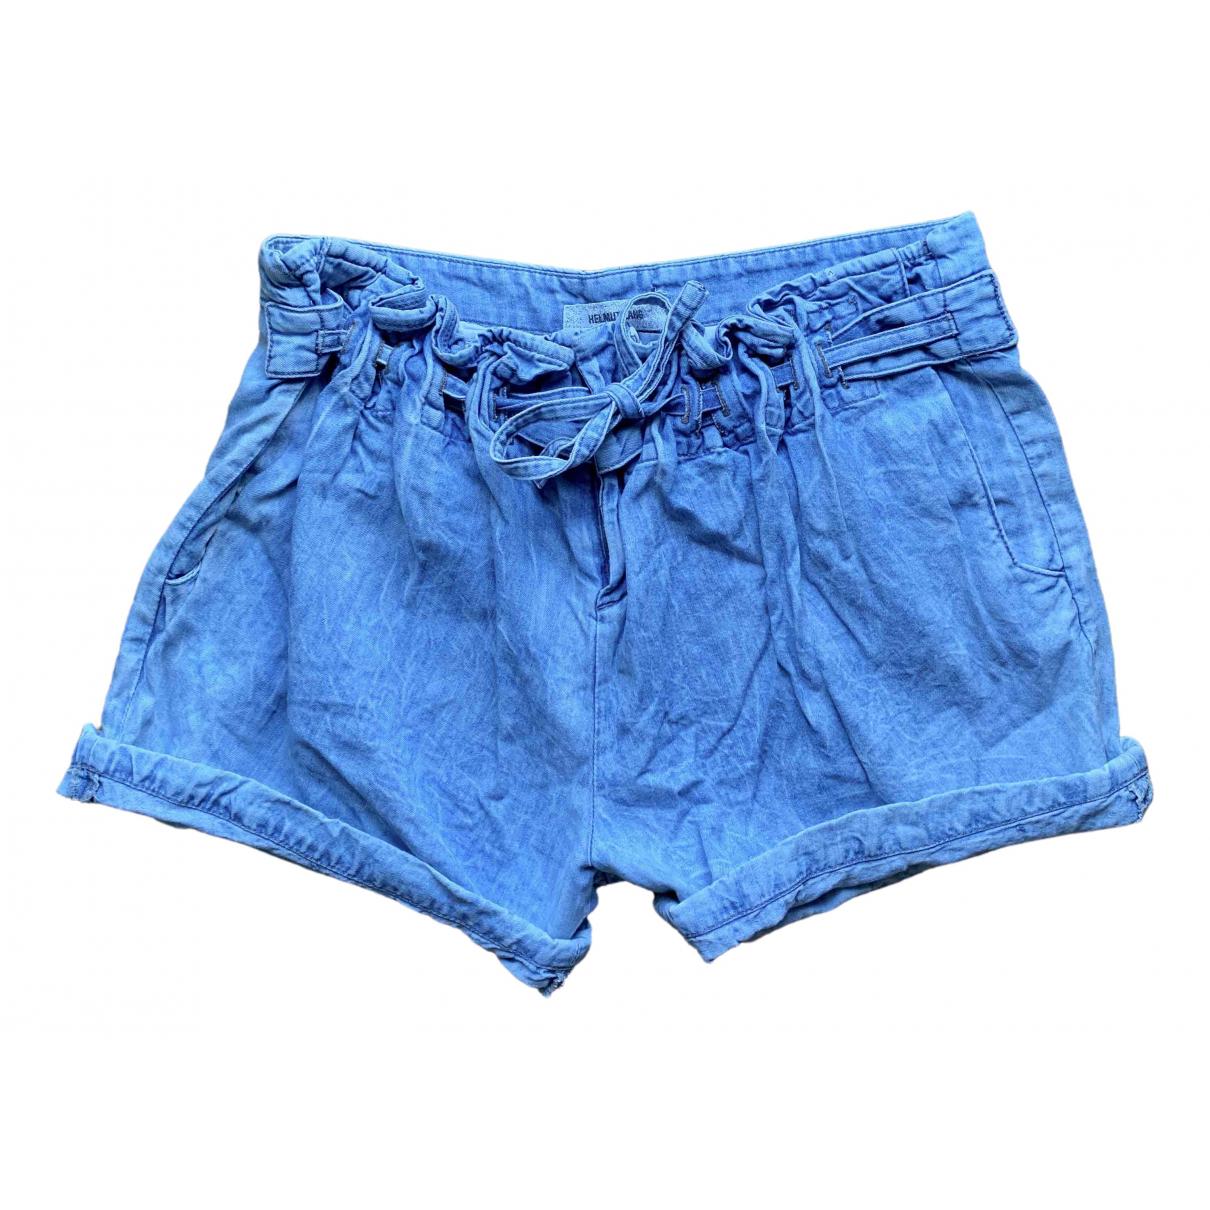 Helmut Lang \N Blue Denim - Jeans Shorts for Women 2 US